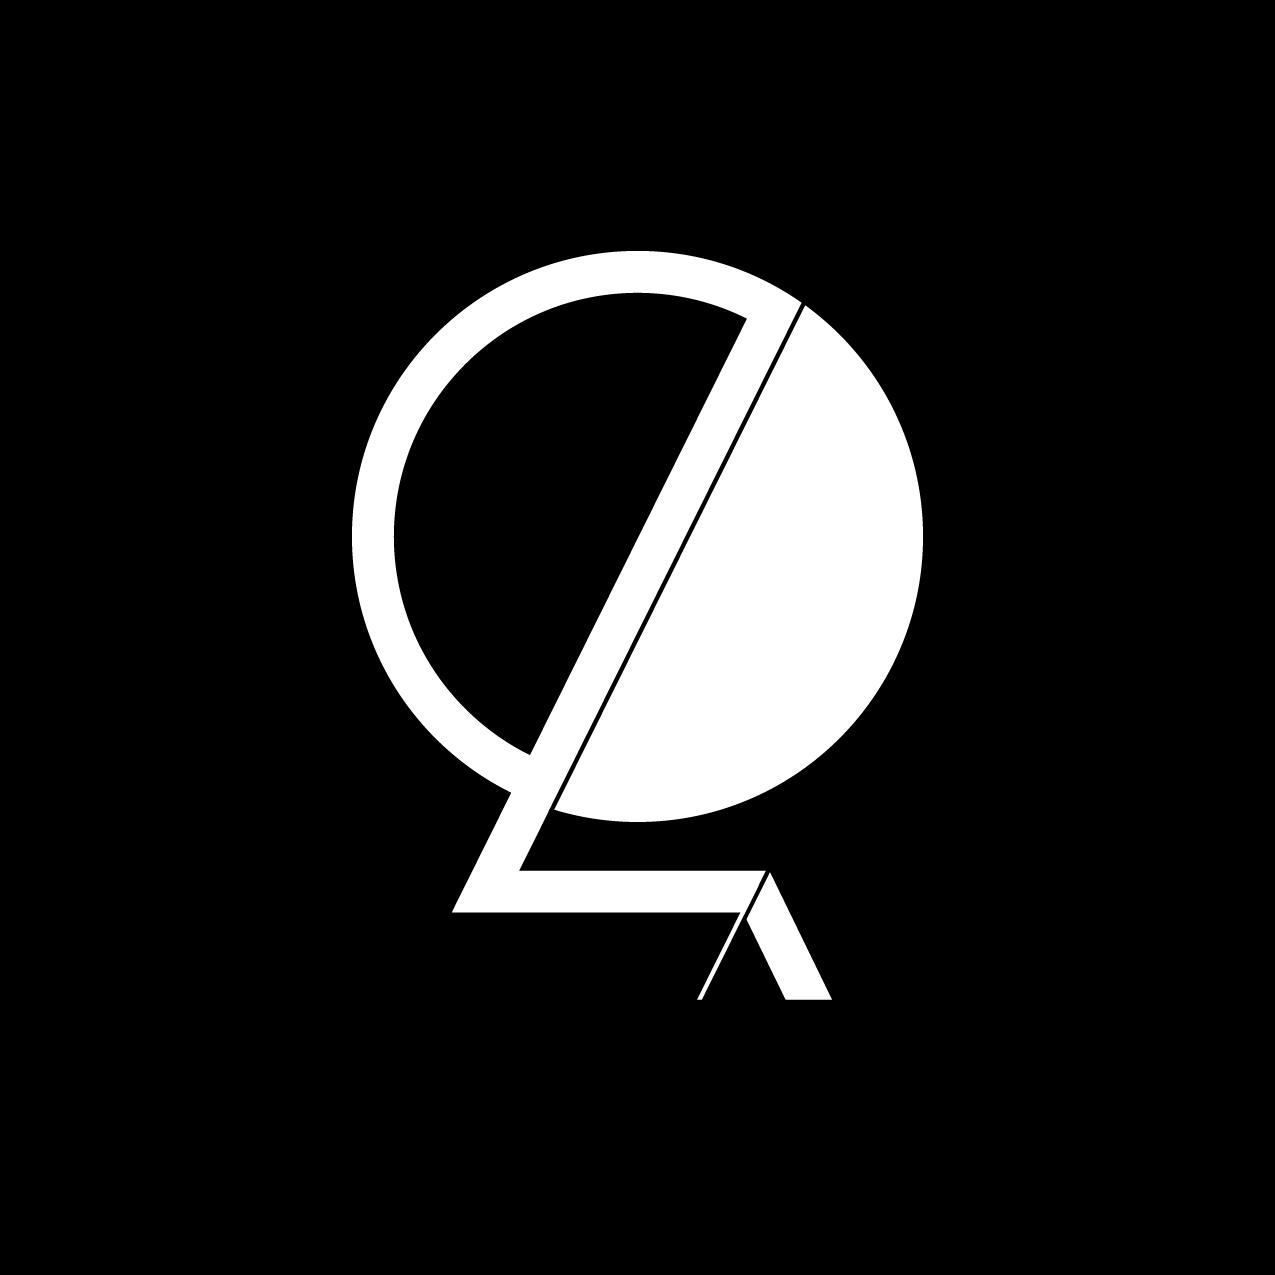 Letter Q7 Design by Furia